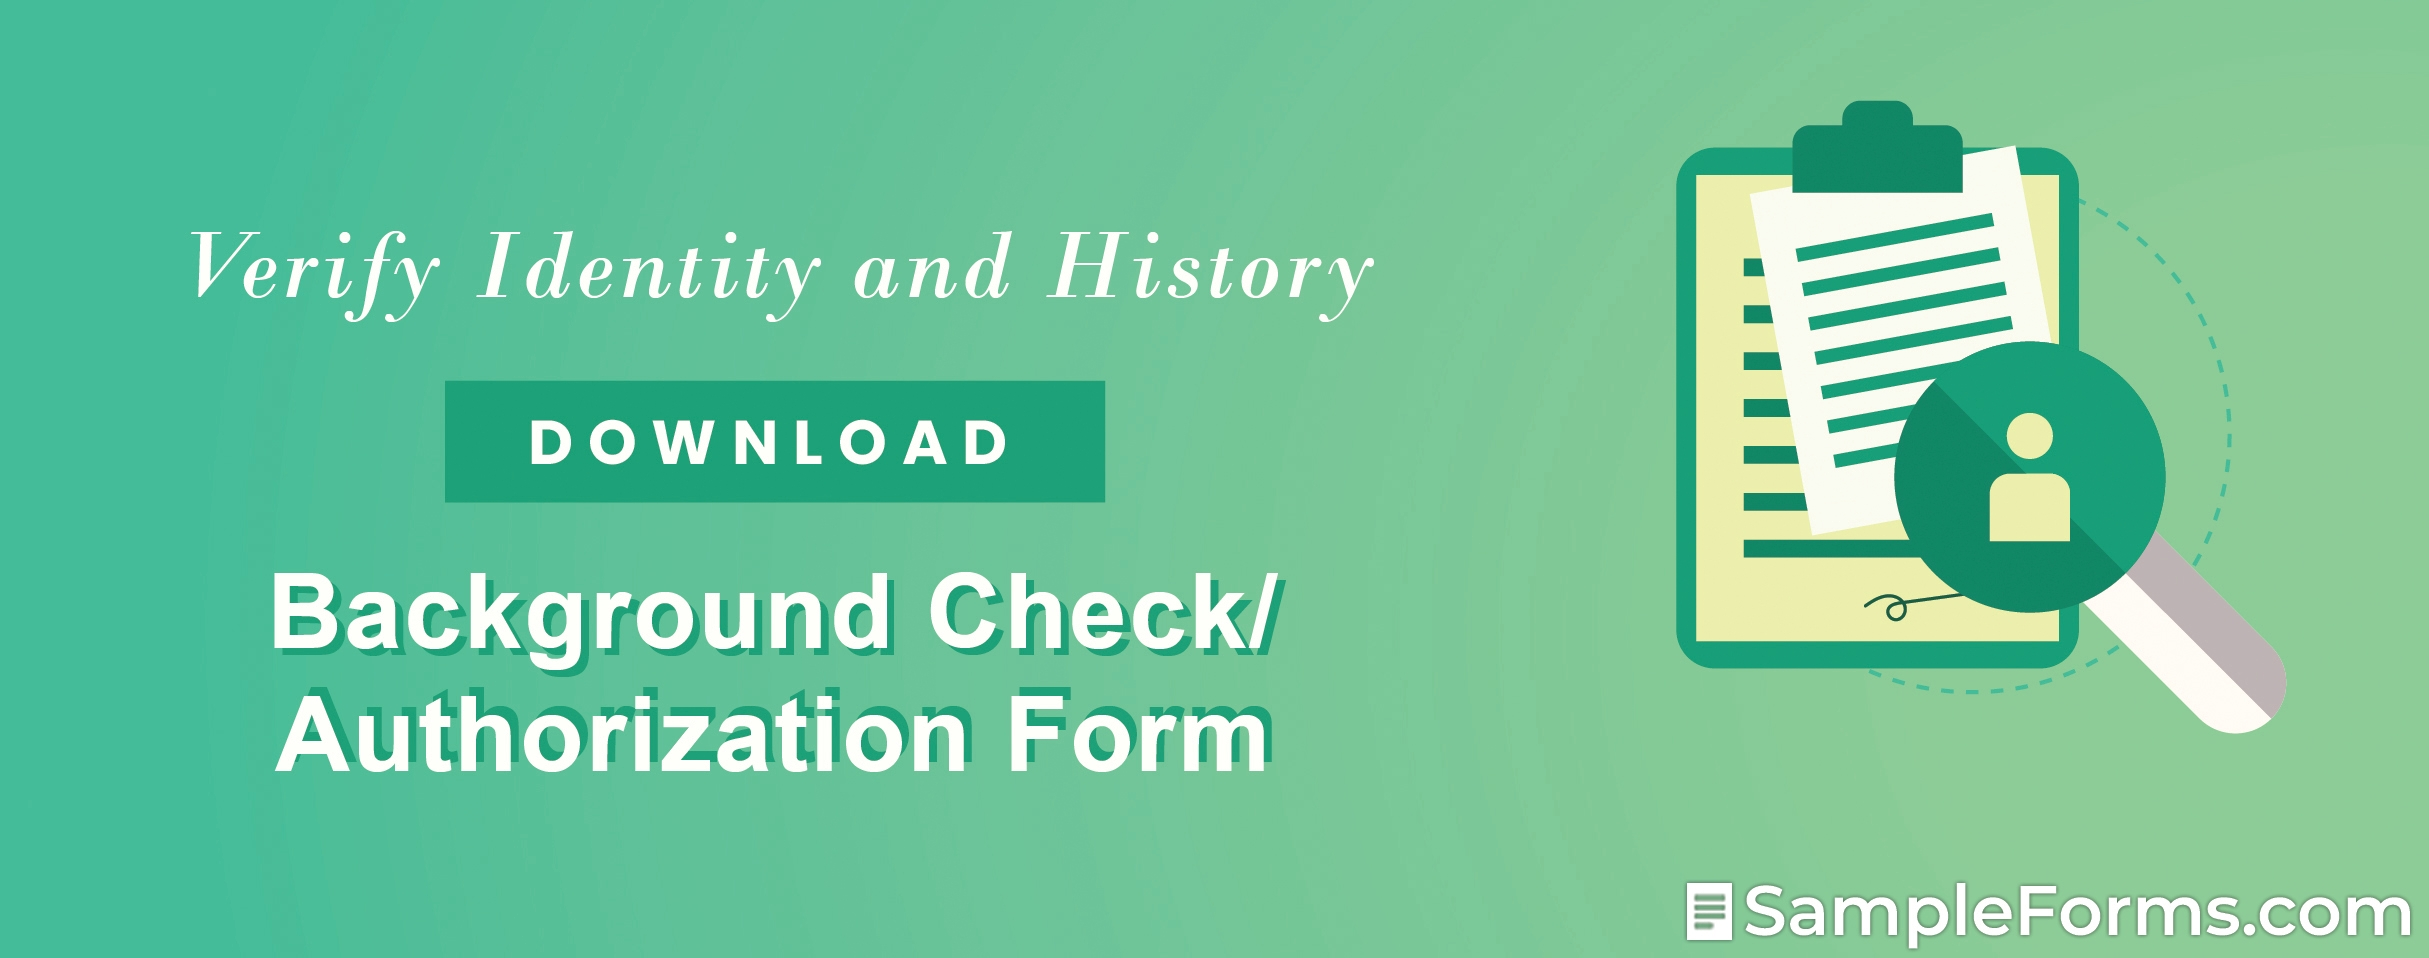 Background CheckAuthorization Form